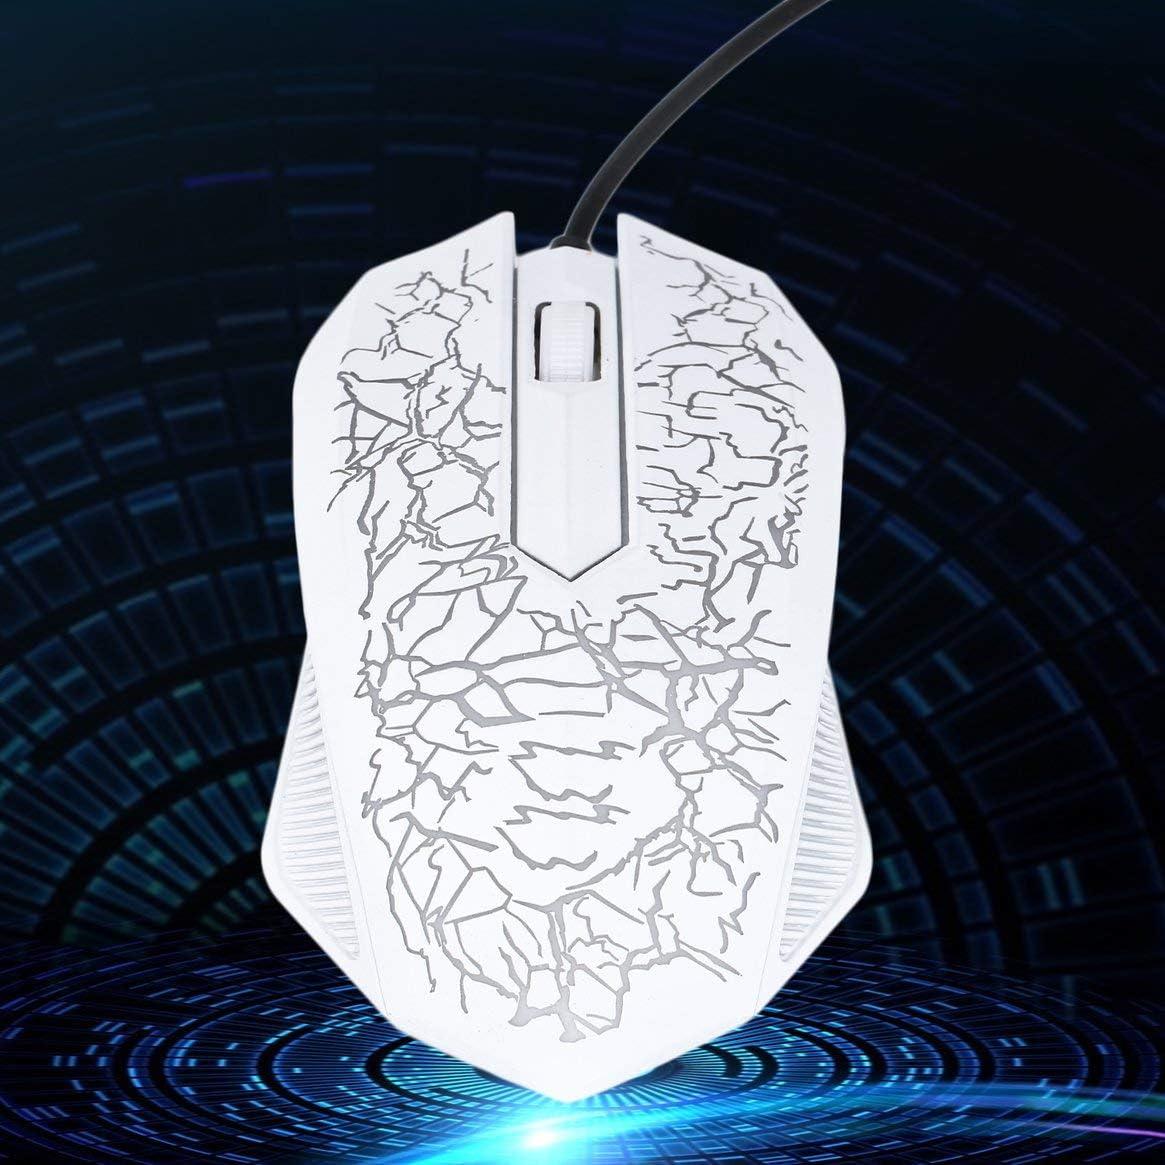 Kongqiabona-UK 3200DPI LED Optique 3 Boutons 3D USB Filaire Gaming Game Mouse Pro Gamer Souris Dordinateur pour PC R/églable USB Filaire Gaming Mouse